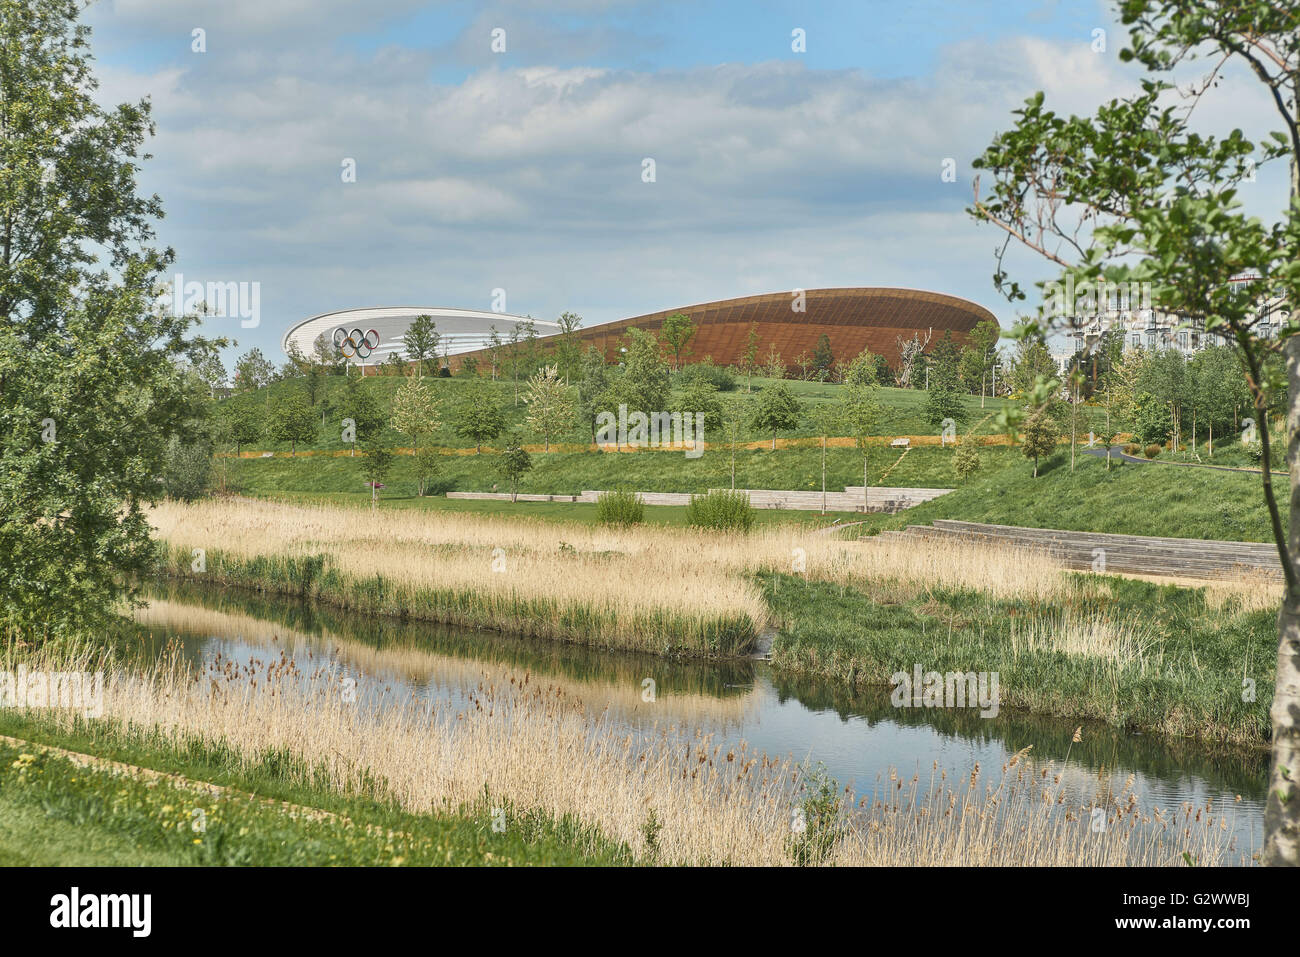 Olympic Park London,  Velodrome - Stock Image